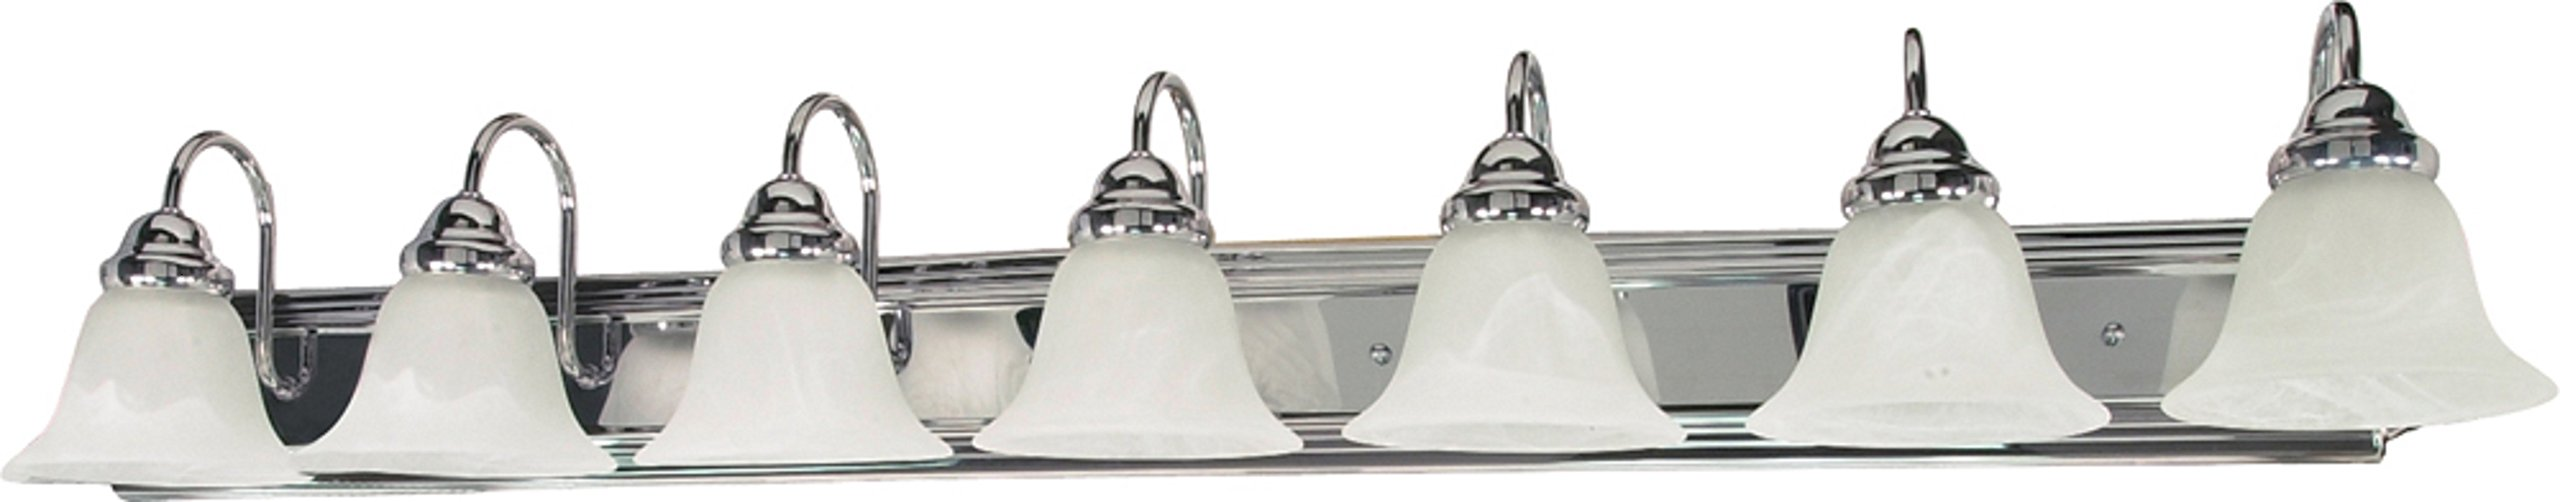 Filament Design 7778127290 7-Light Polished Vanity Light with Alabaster Glass Bell Shades, Chrome